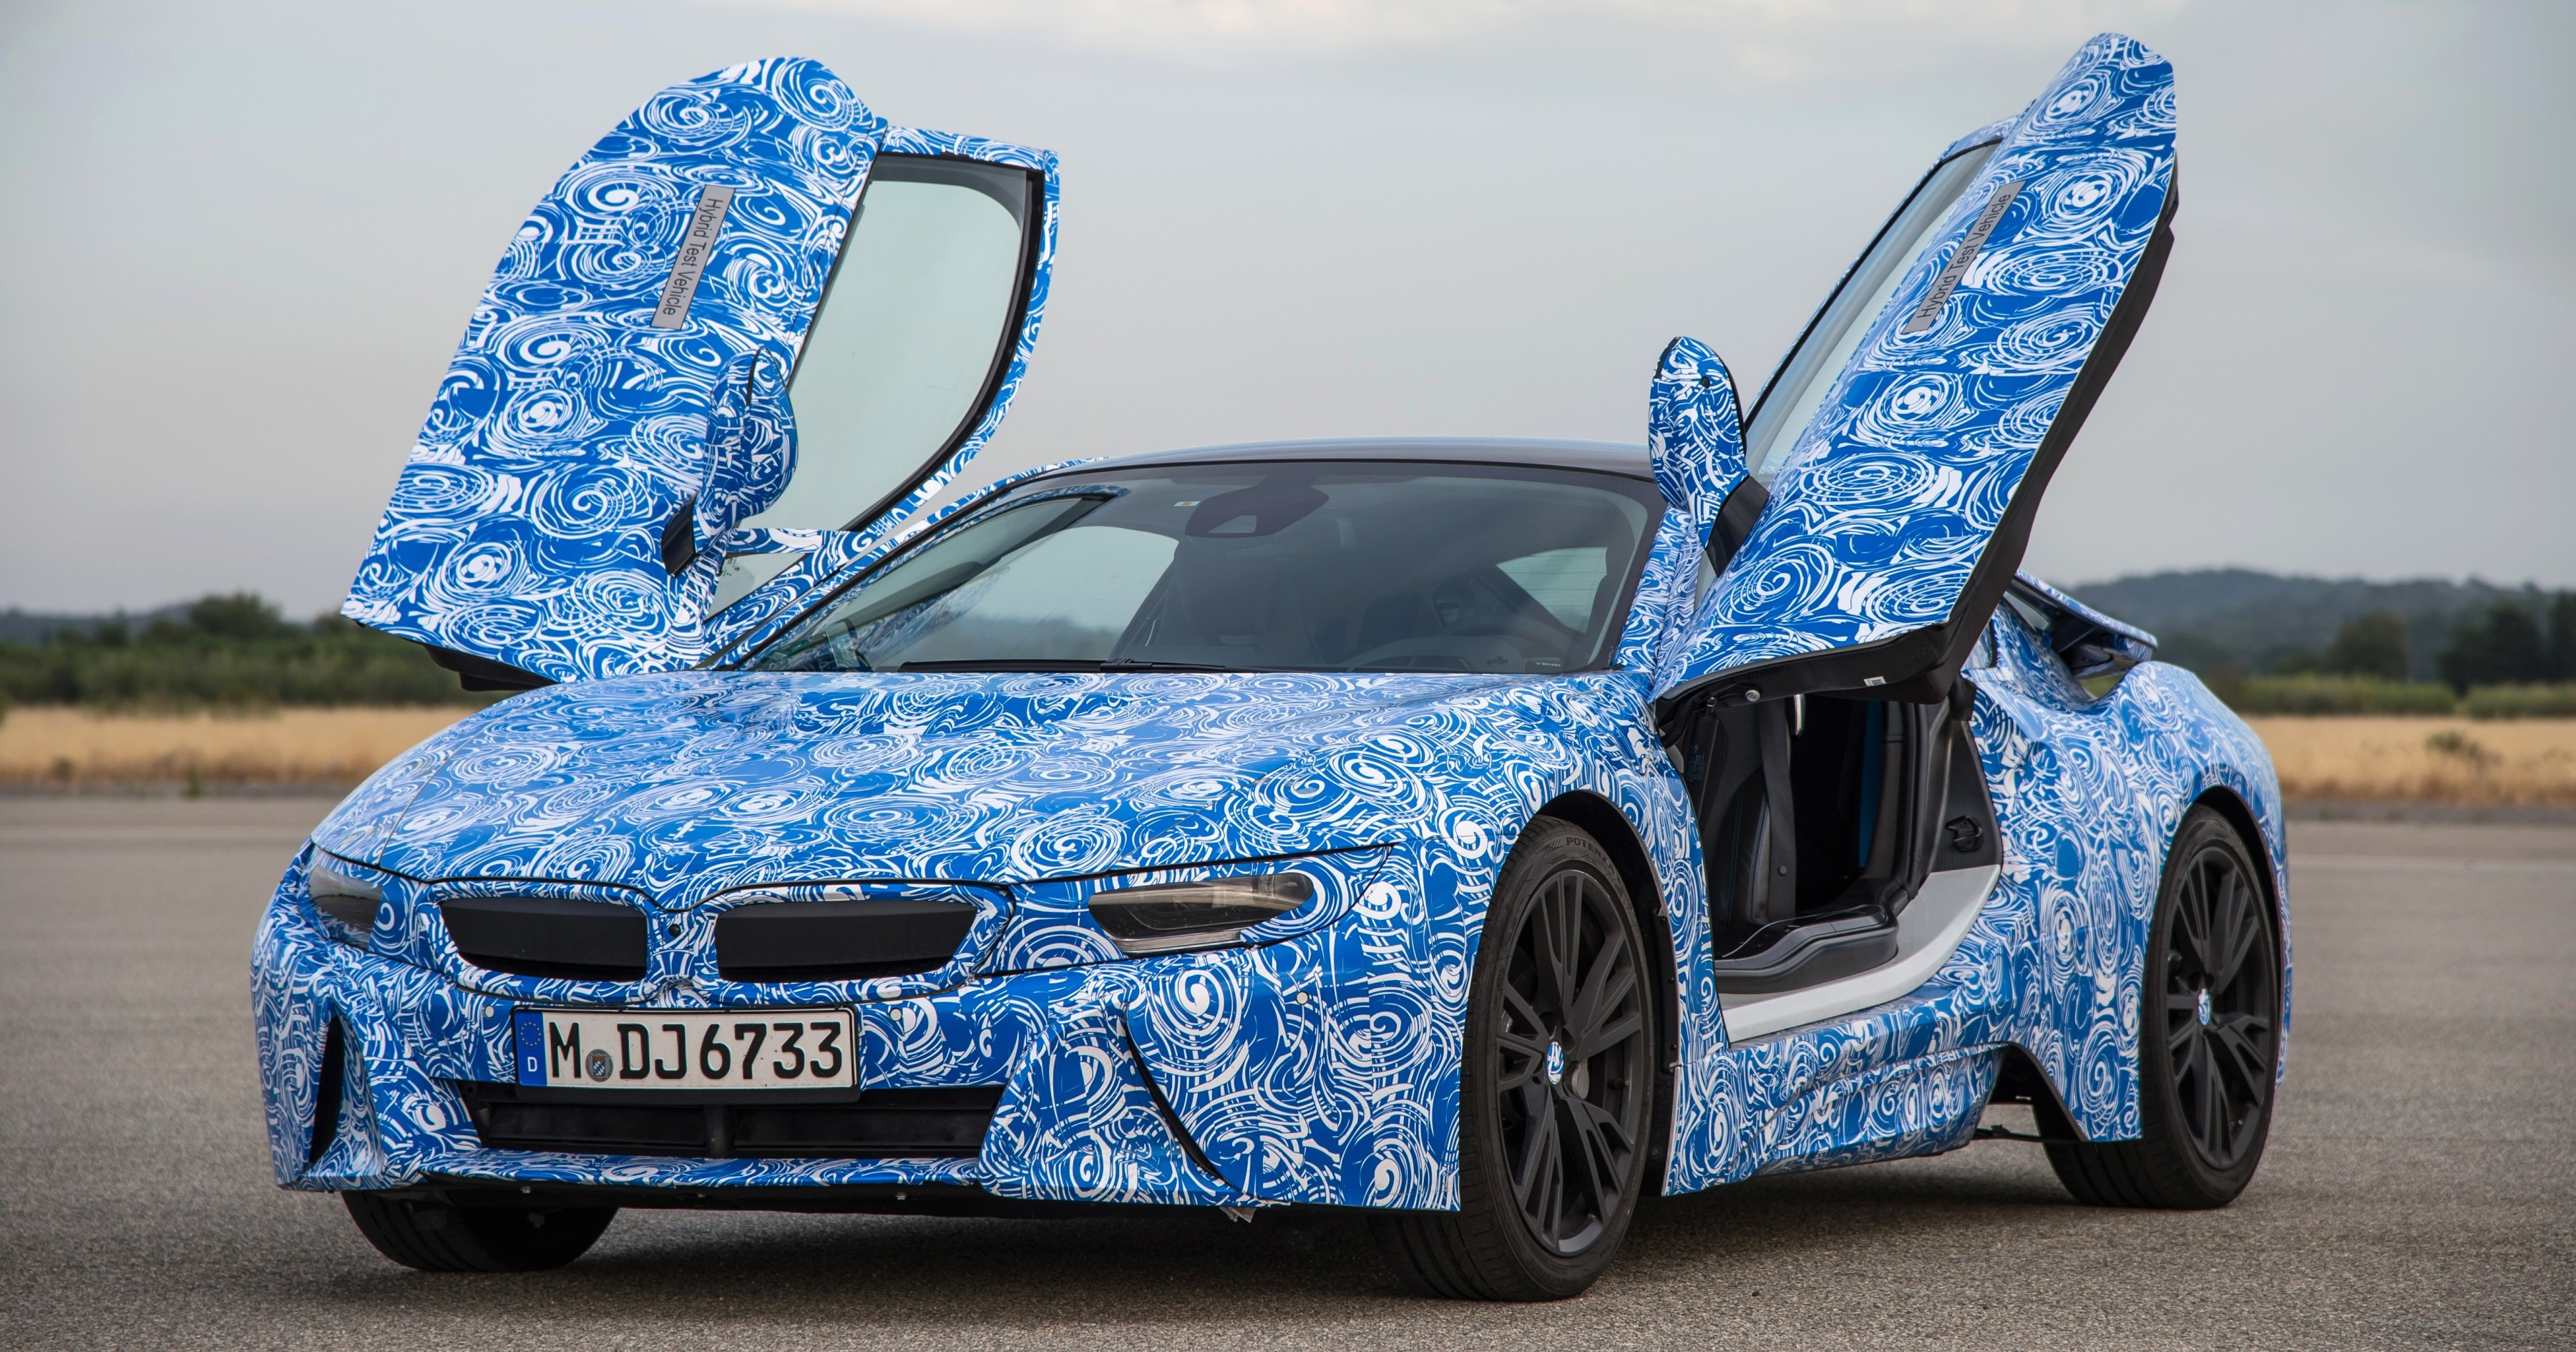 Bmw Vehicle Full Form >> Bmw I8 To Make Production Debut At Frankfurt Show Paul Tan Image